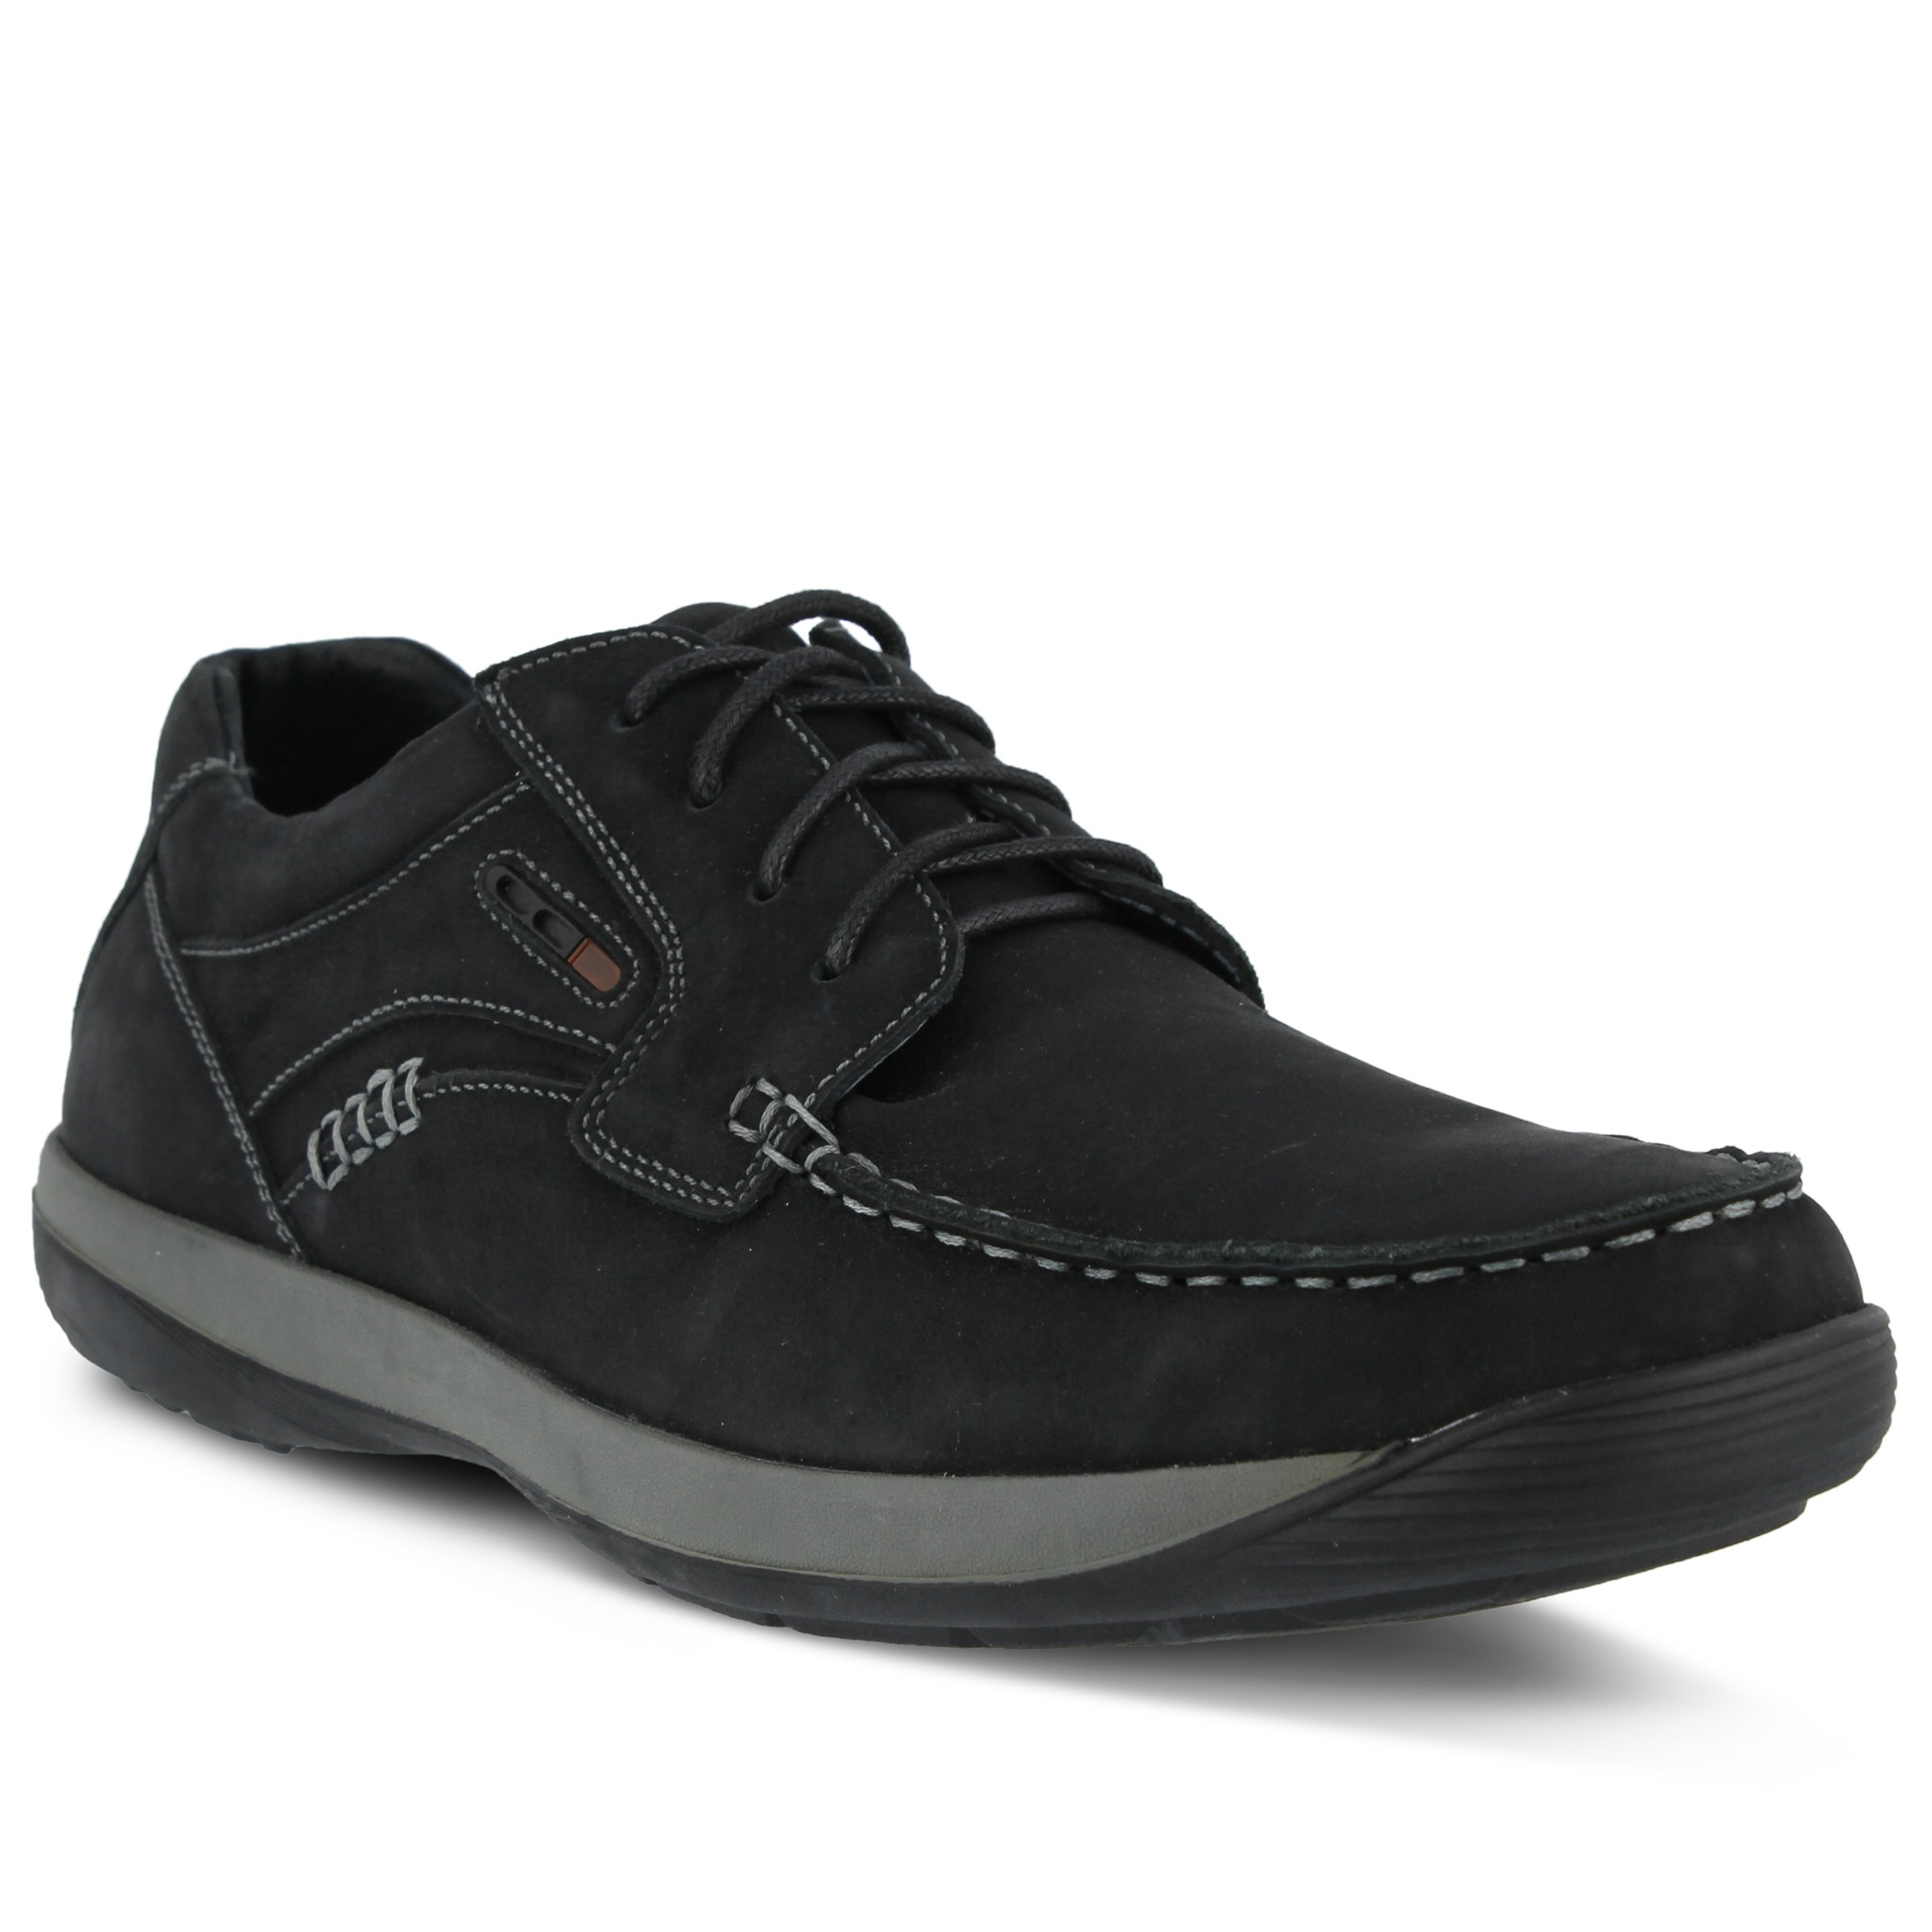 Spring Step Men Men's Duncan Men's Lace-Up Shoes